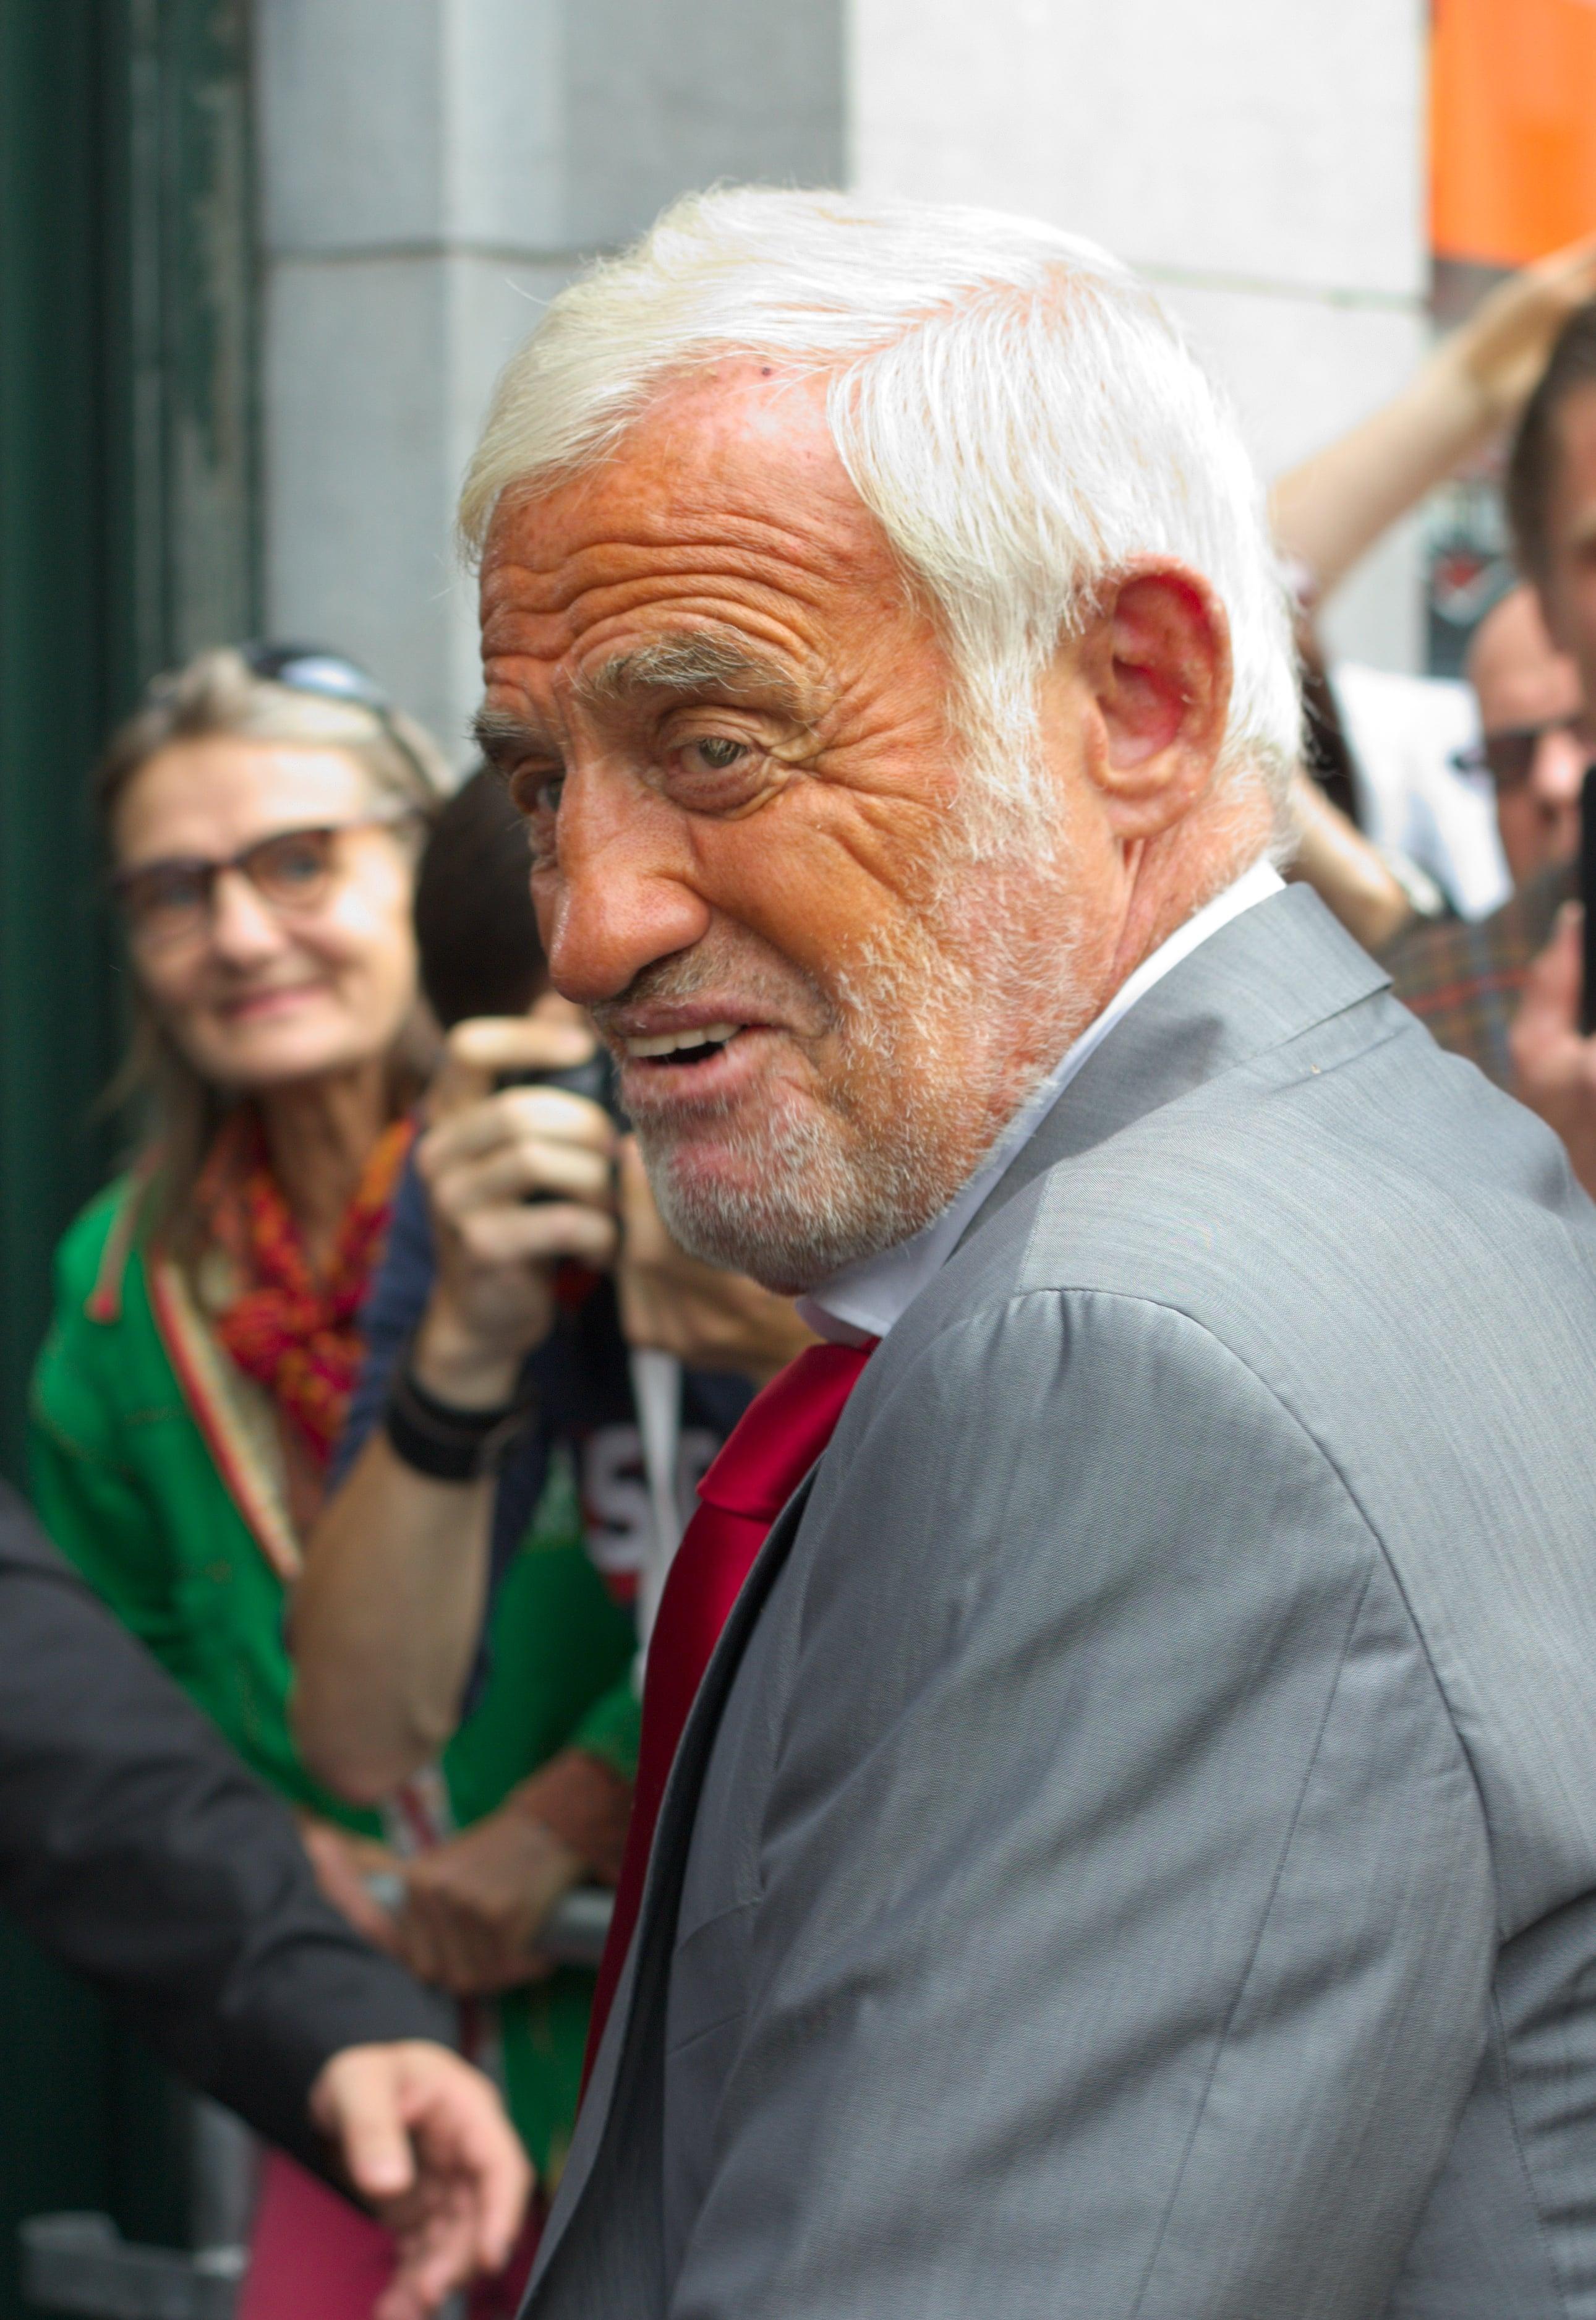 Jean-Paul Belmondo For mobile